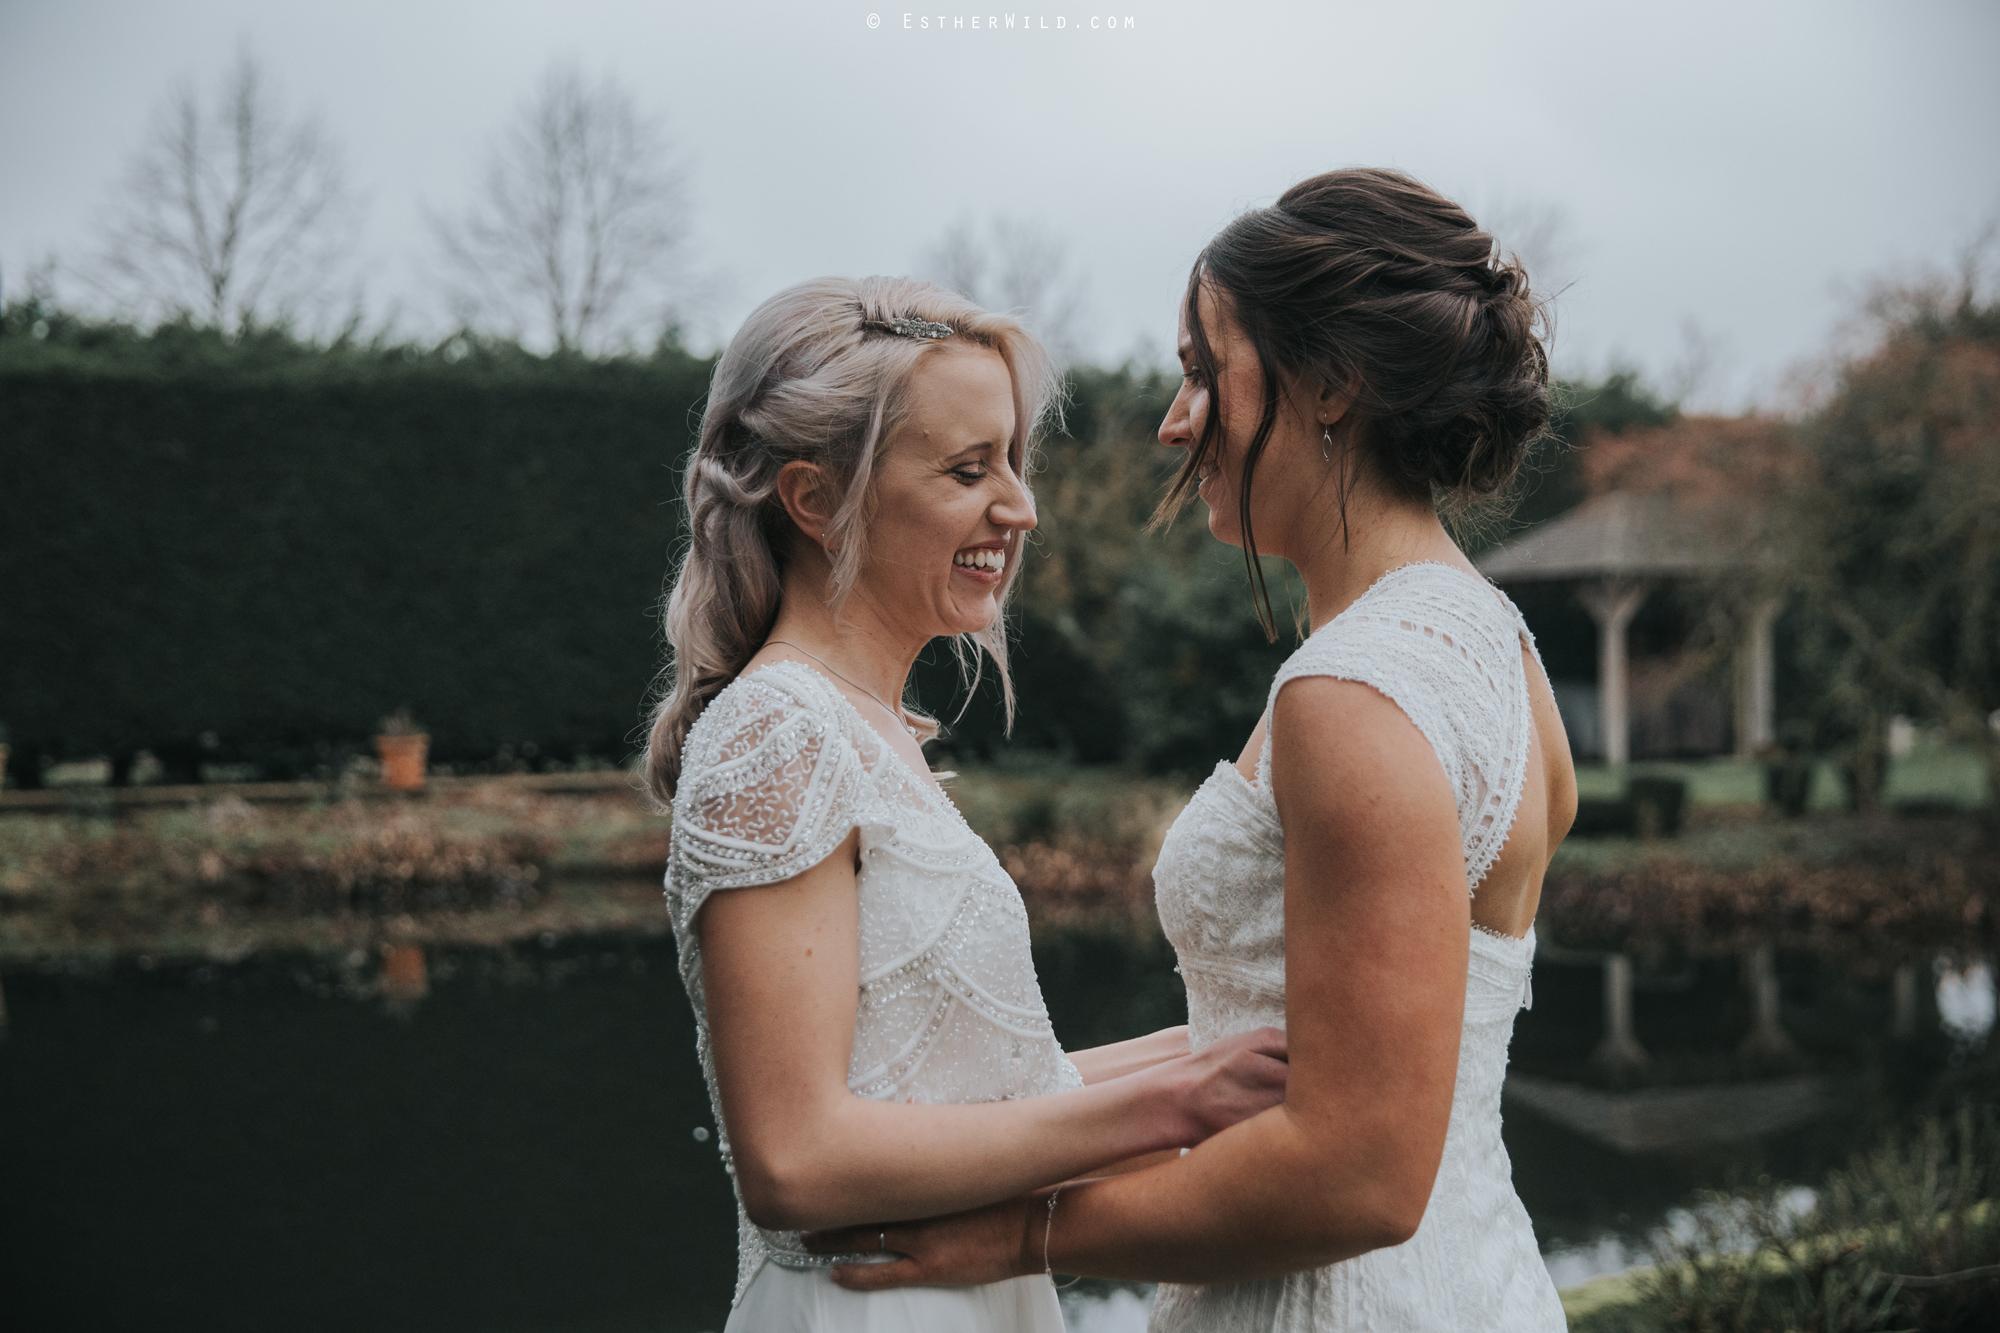 Elms_Barn_Weddings_Suffolk_Photographer_Copyright_Esther_Wild_IMG_2126.jpg